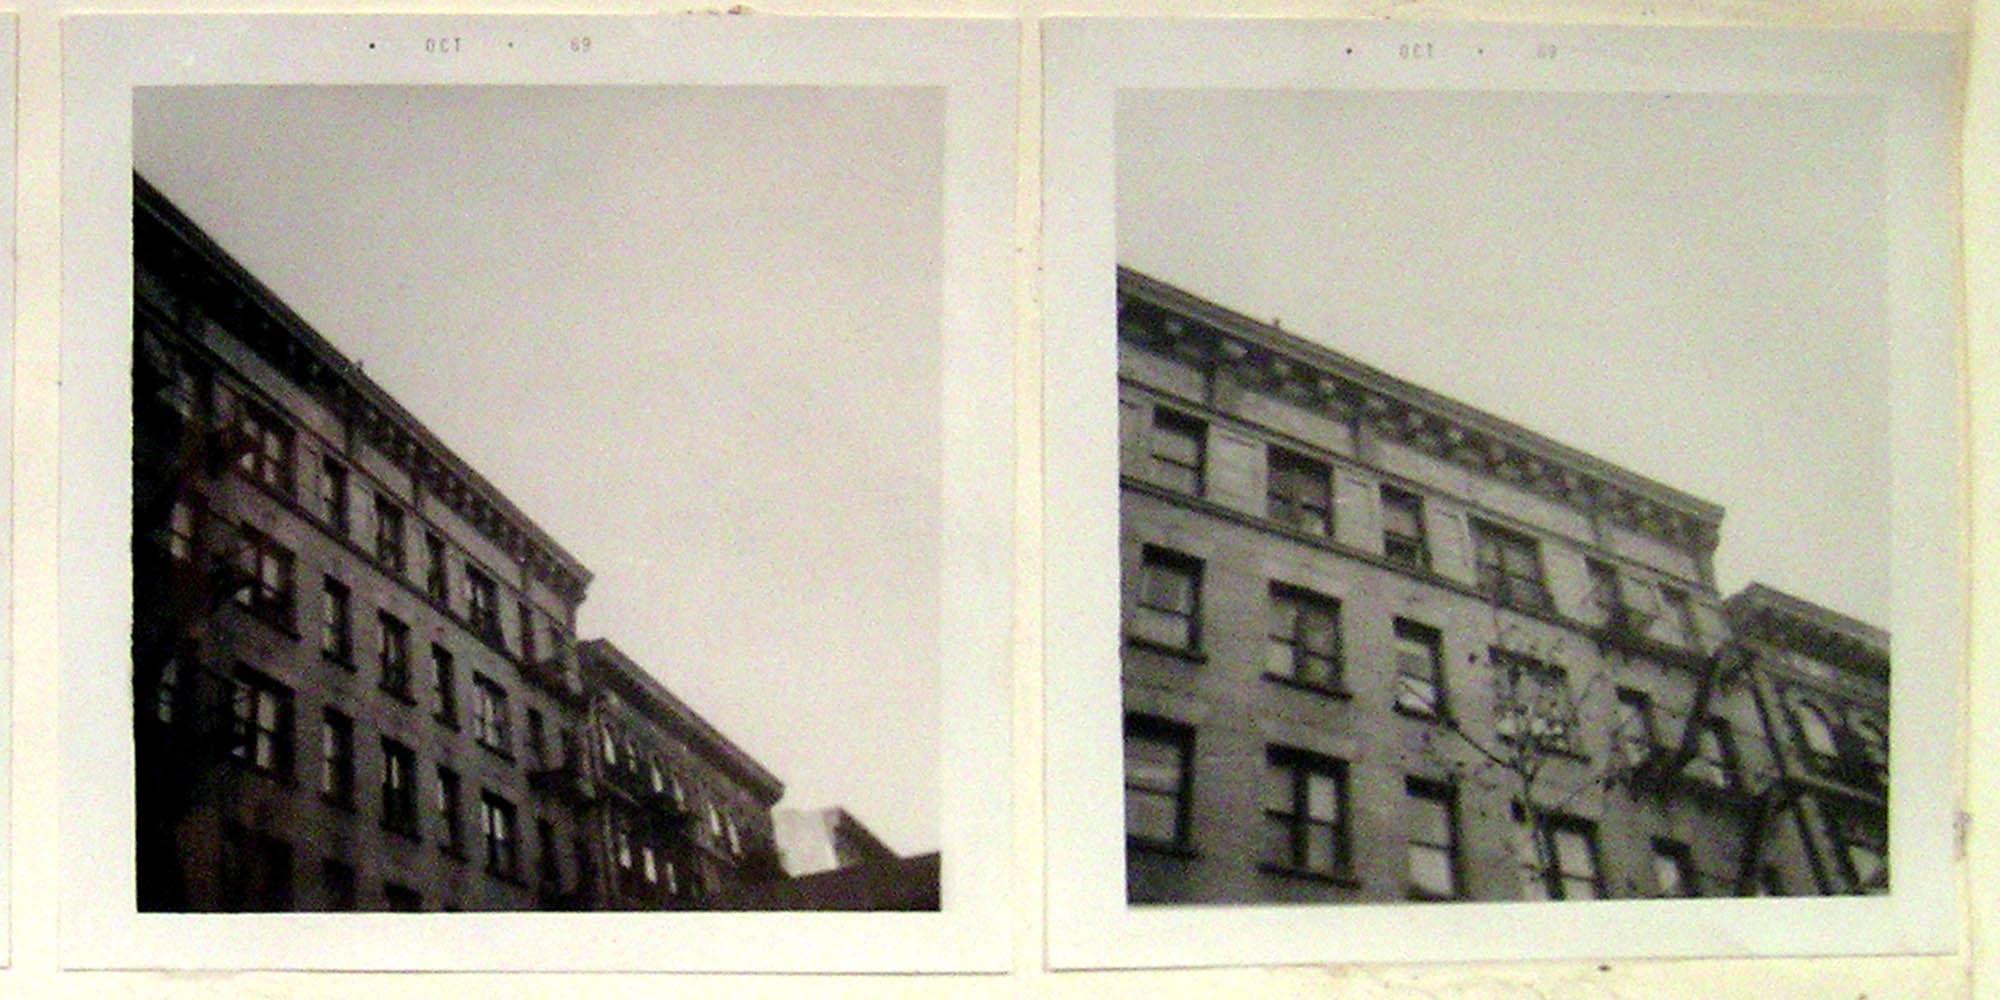 Vito Acconci: Performance Documentation & Photoworks, 1969–1973